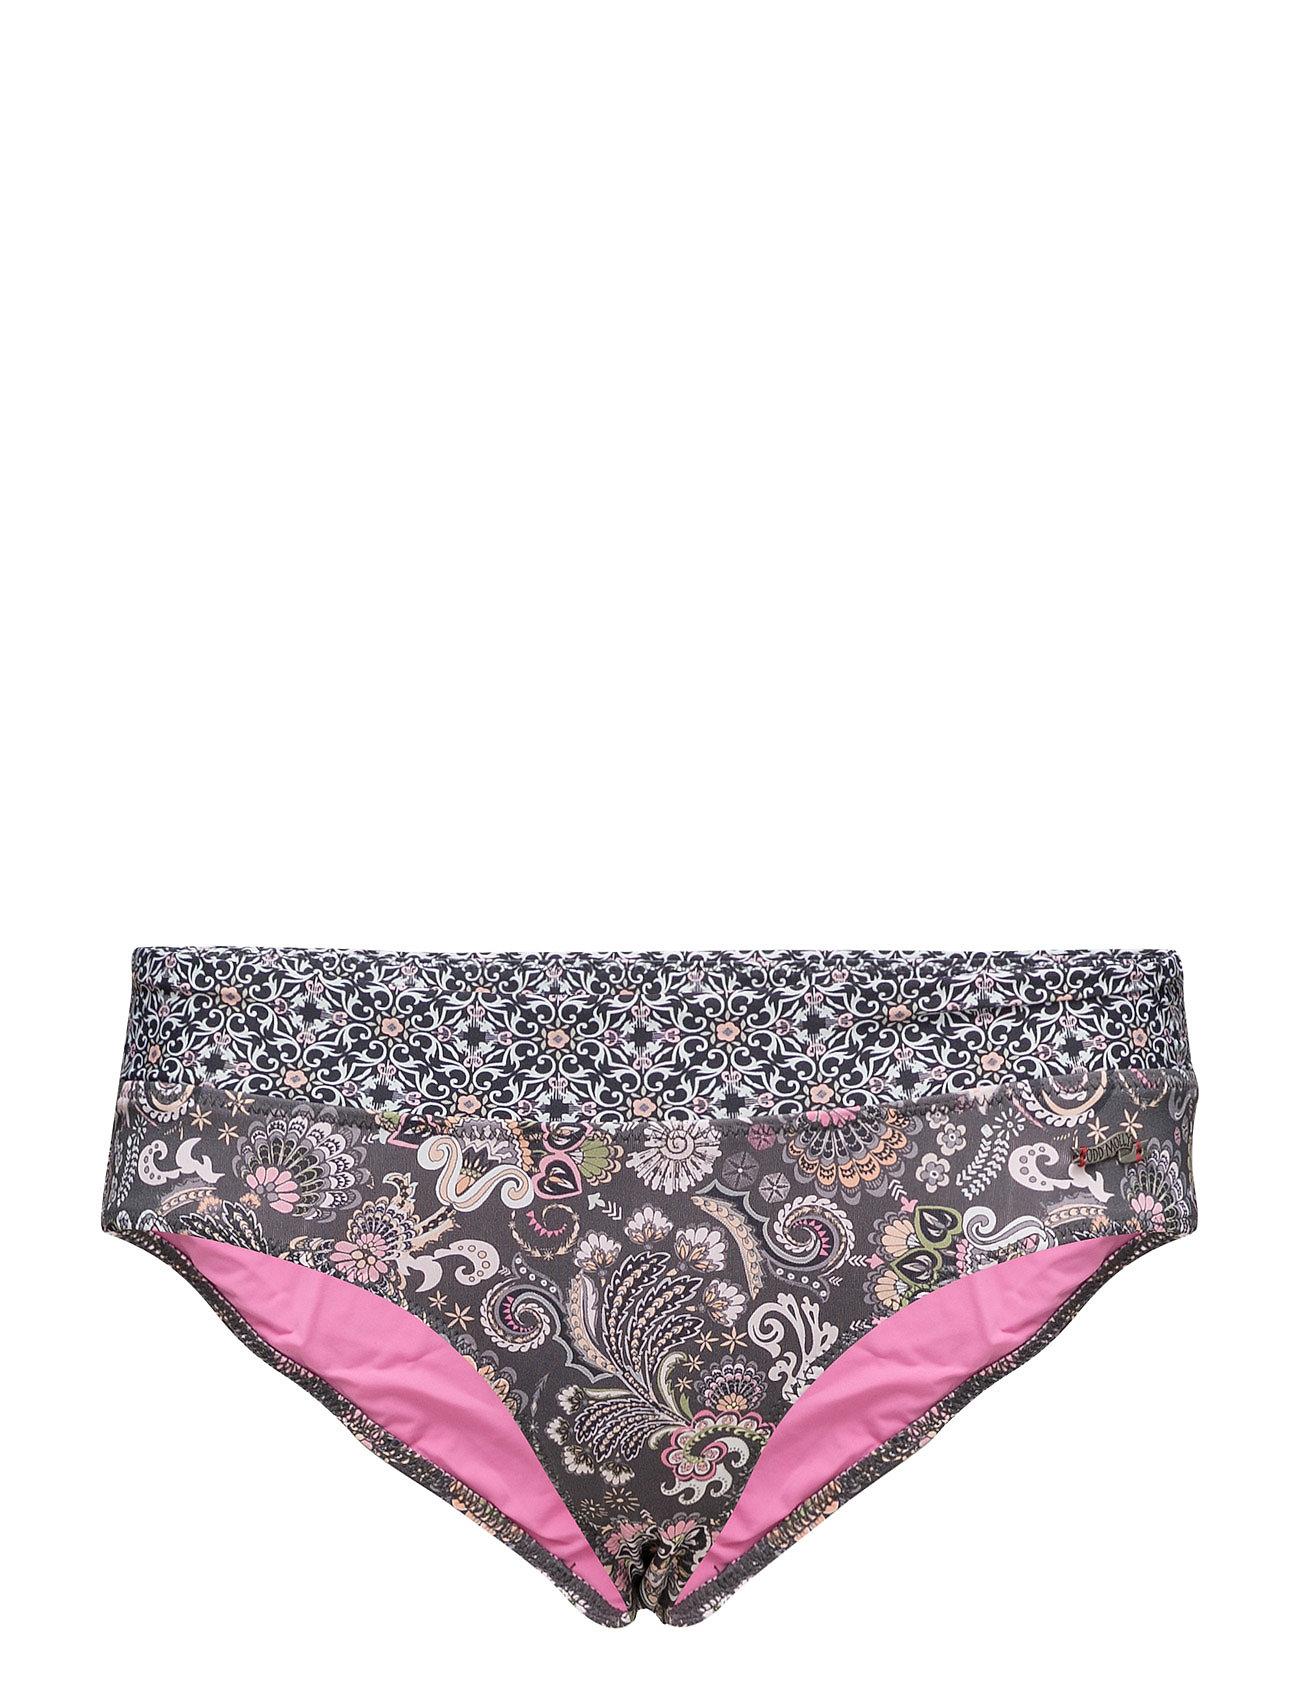 ODD MOLLY UNDERWEAR & SWIMWEAR safety position bikini bottom - ALMOST BLACK